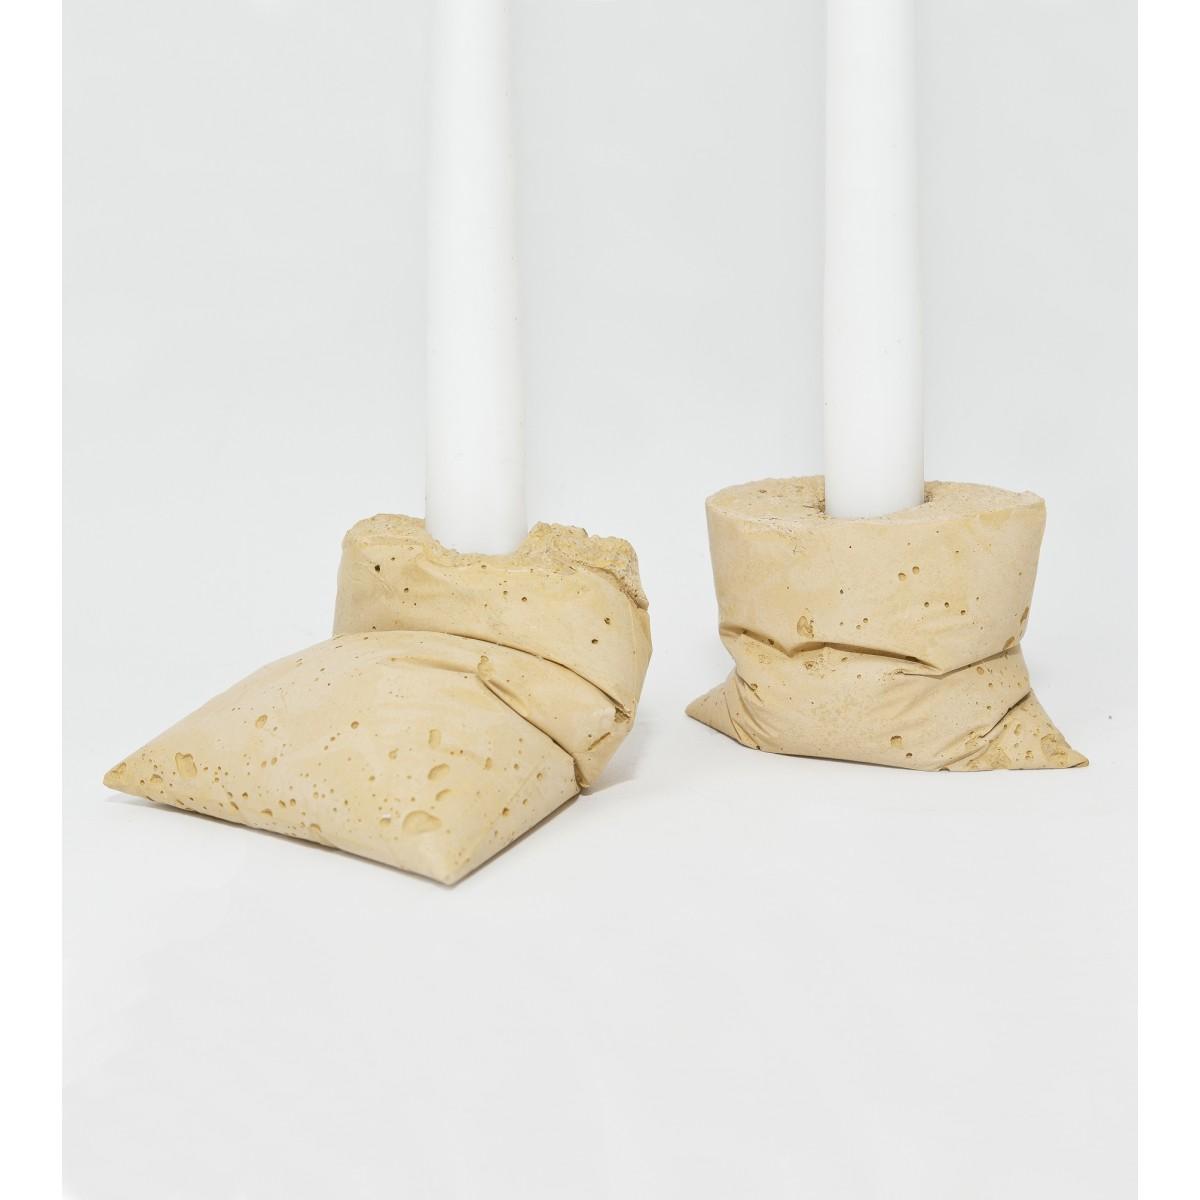 lj lamps kappa gelb zwei kerzenst nder aus beton. Black Bedroom Furniture Sets. Home Design Ideas